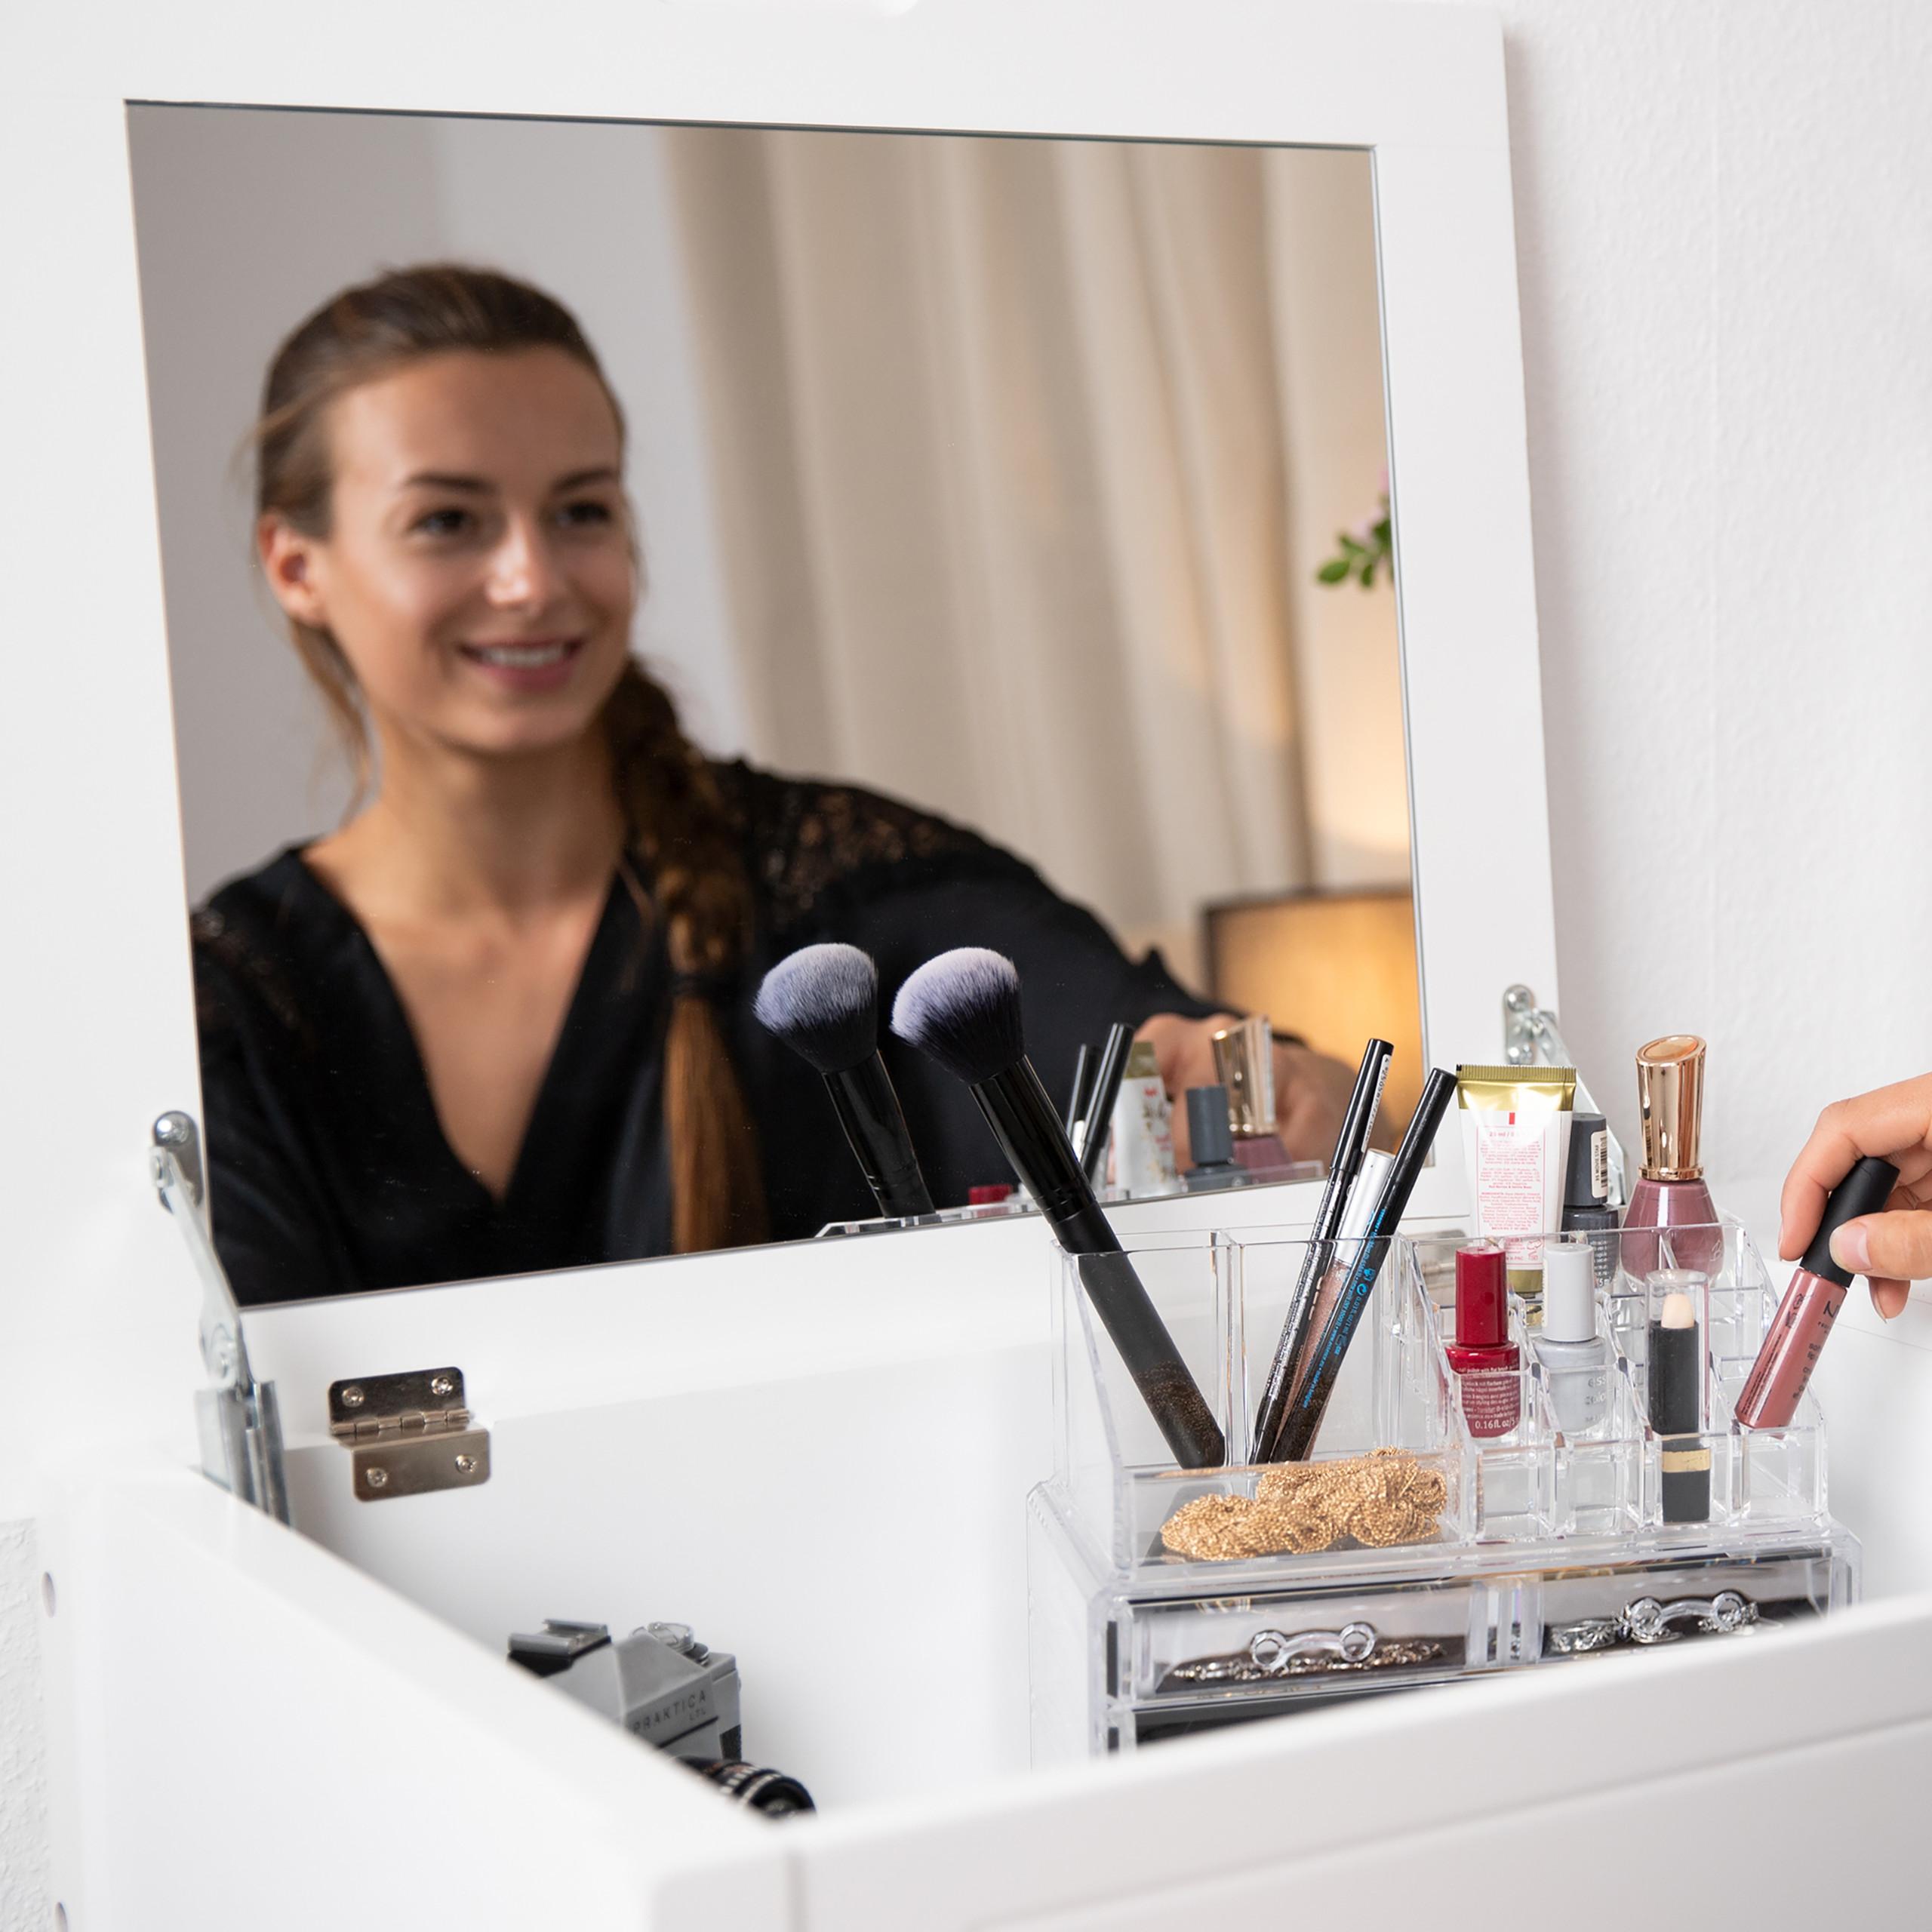 make-up-organizer-met-6-lades-acryl-cosmeticahouder-make-up-cosmetica-opslag miniatuur 7